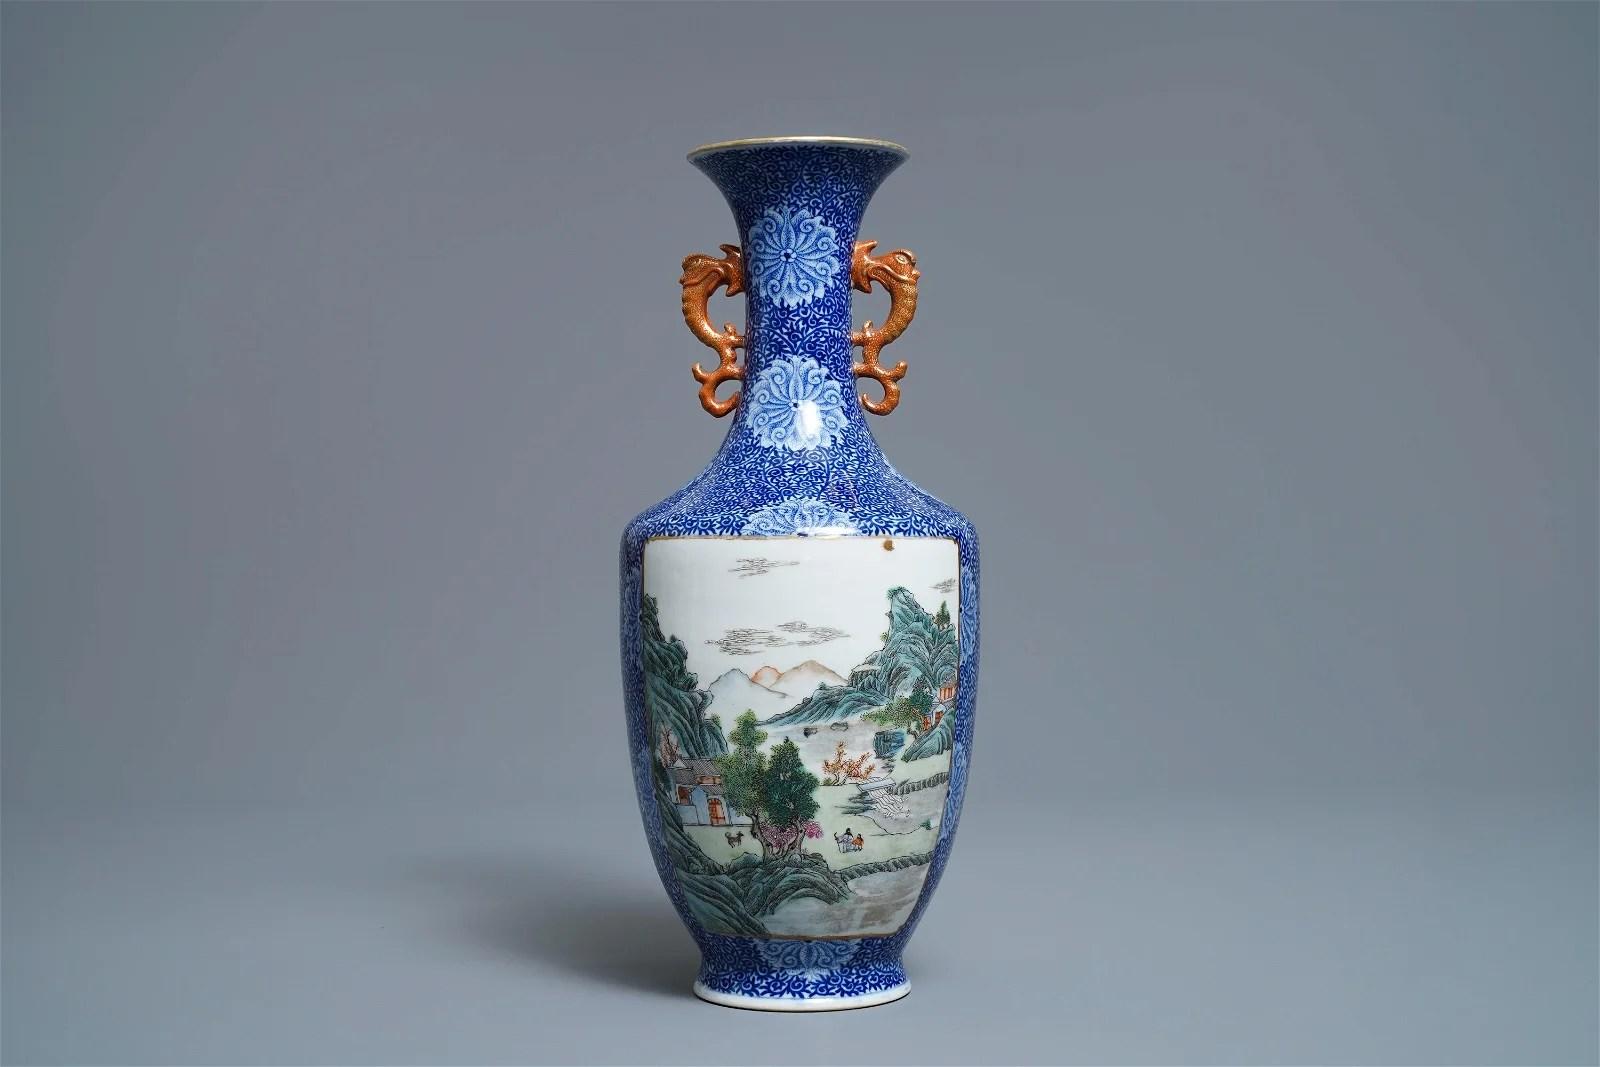 A fine Chinese famille rose 'landscape' vase, Qianlong